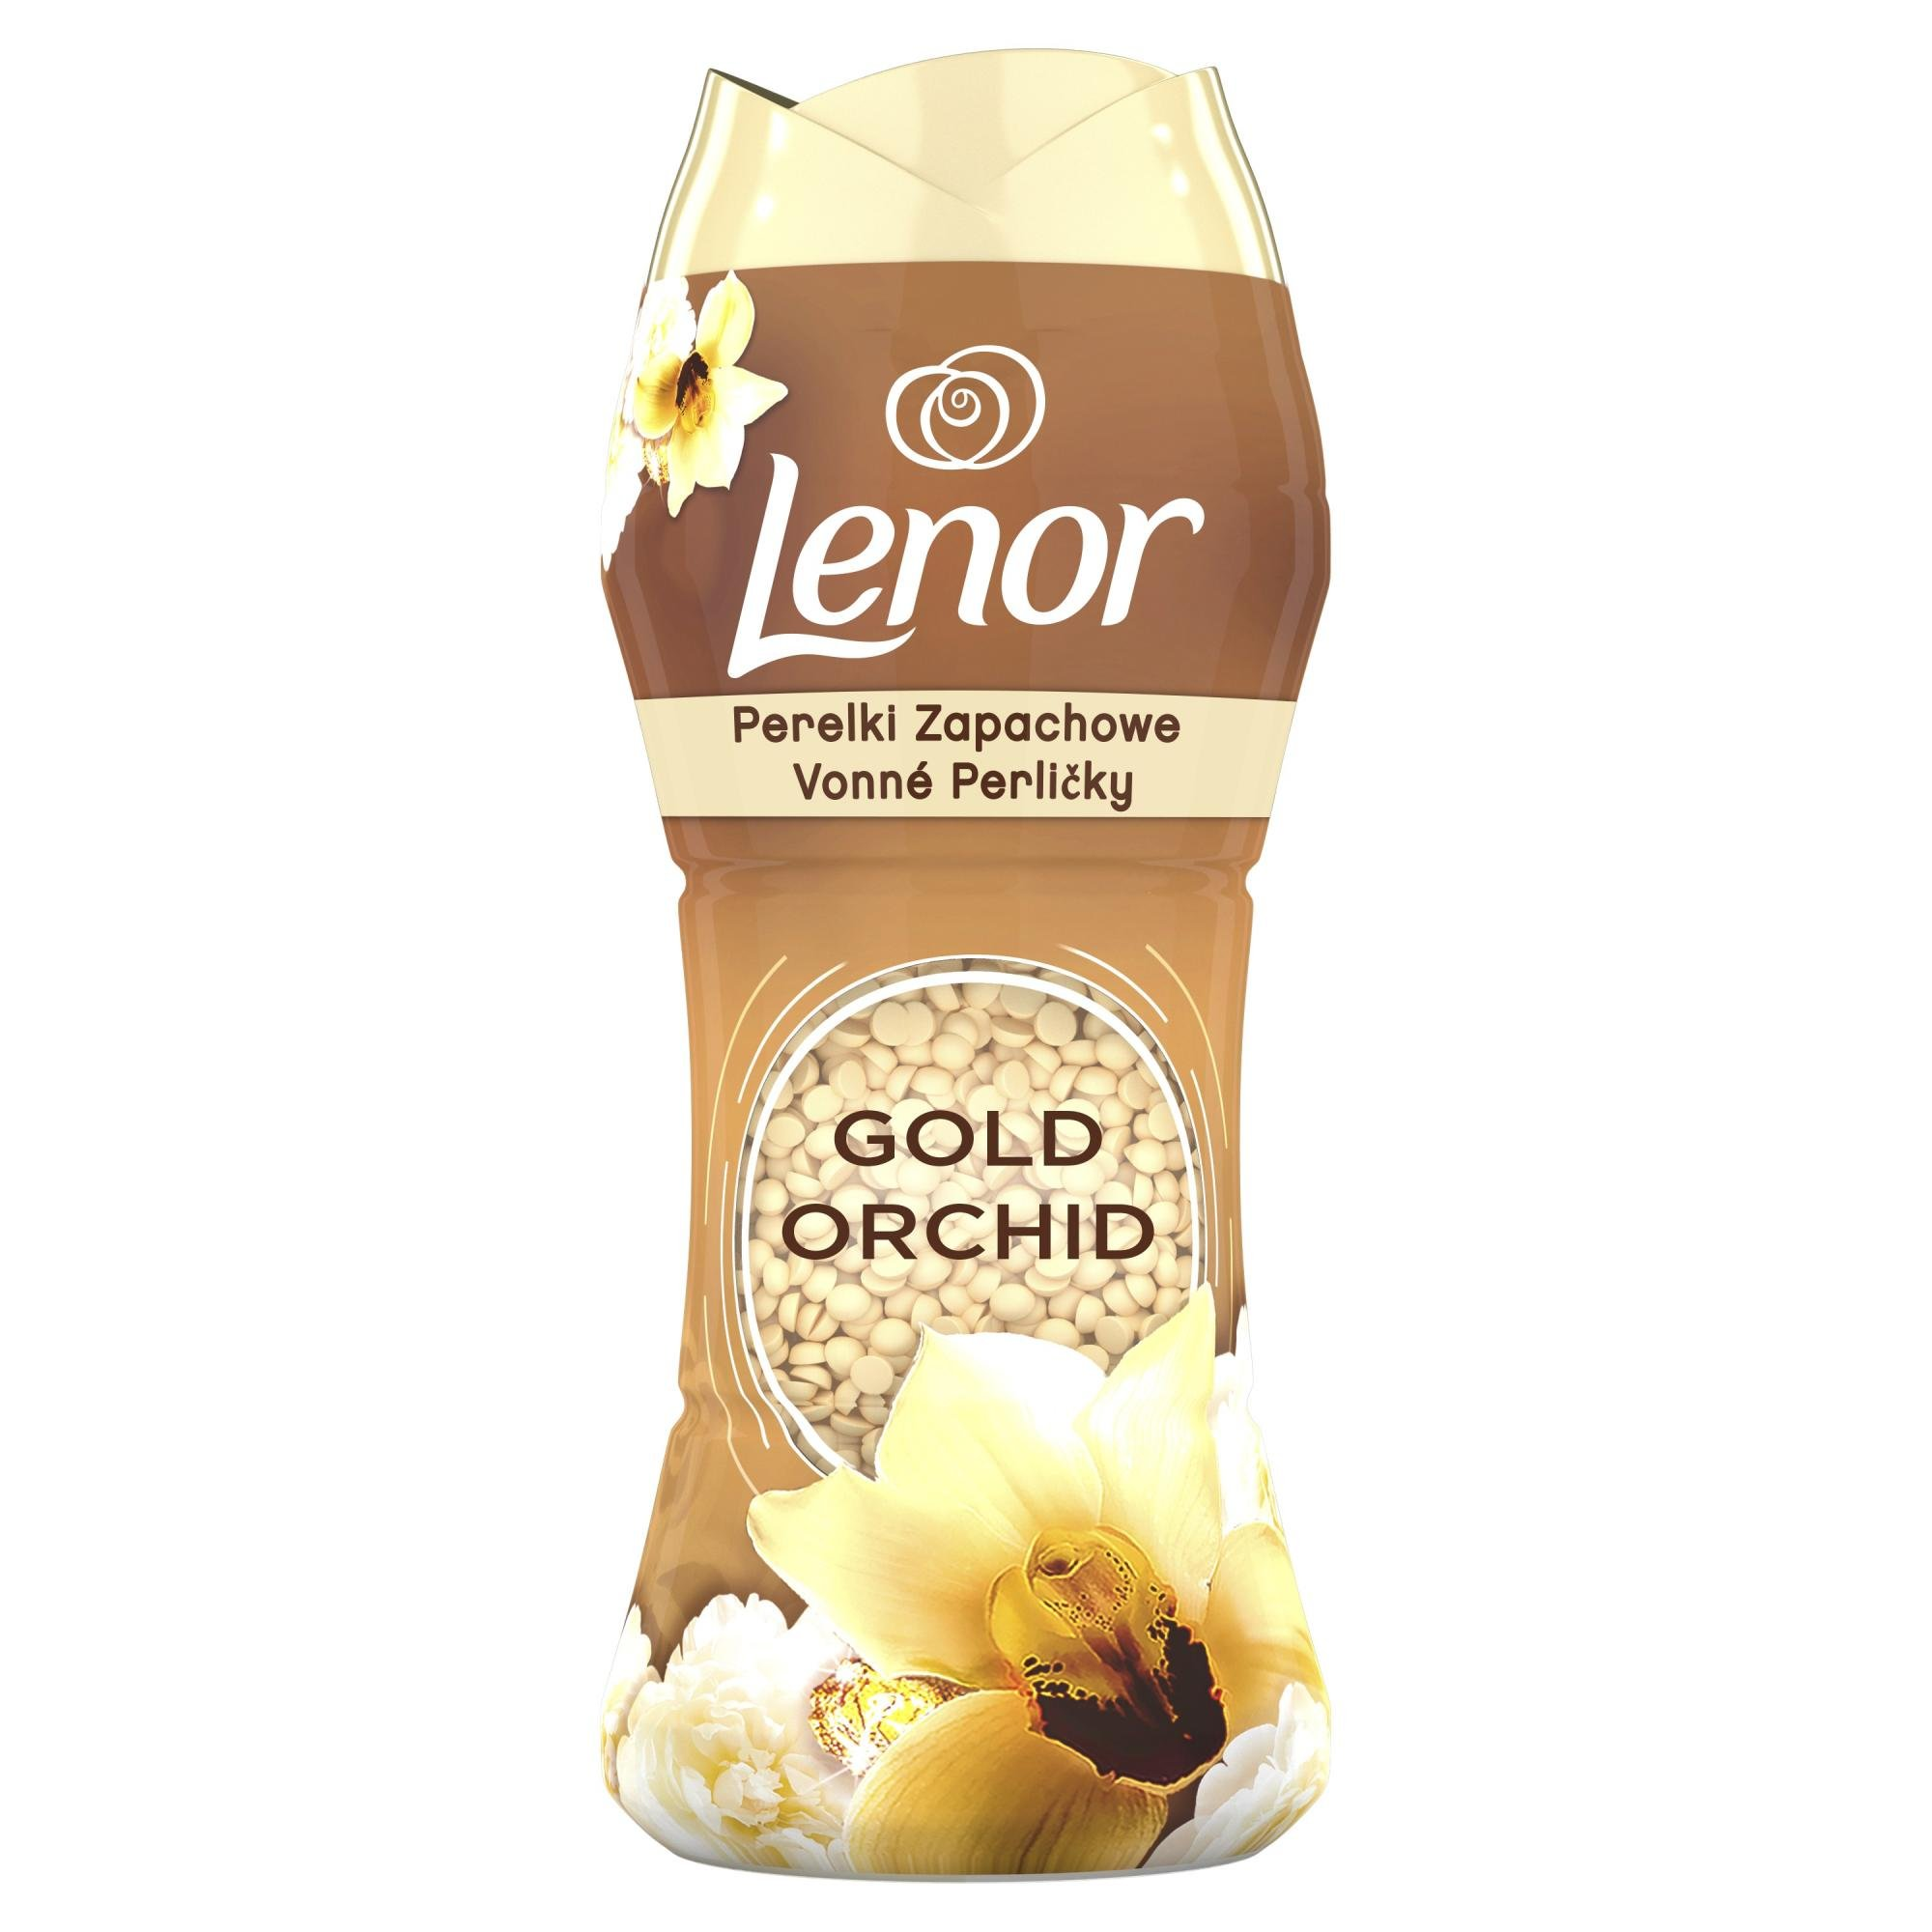 Lenor Unstoppables vonné perličky Gold Orchid 140 g